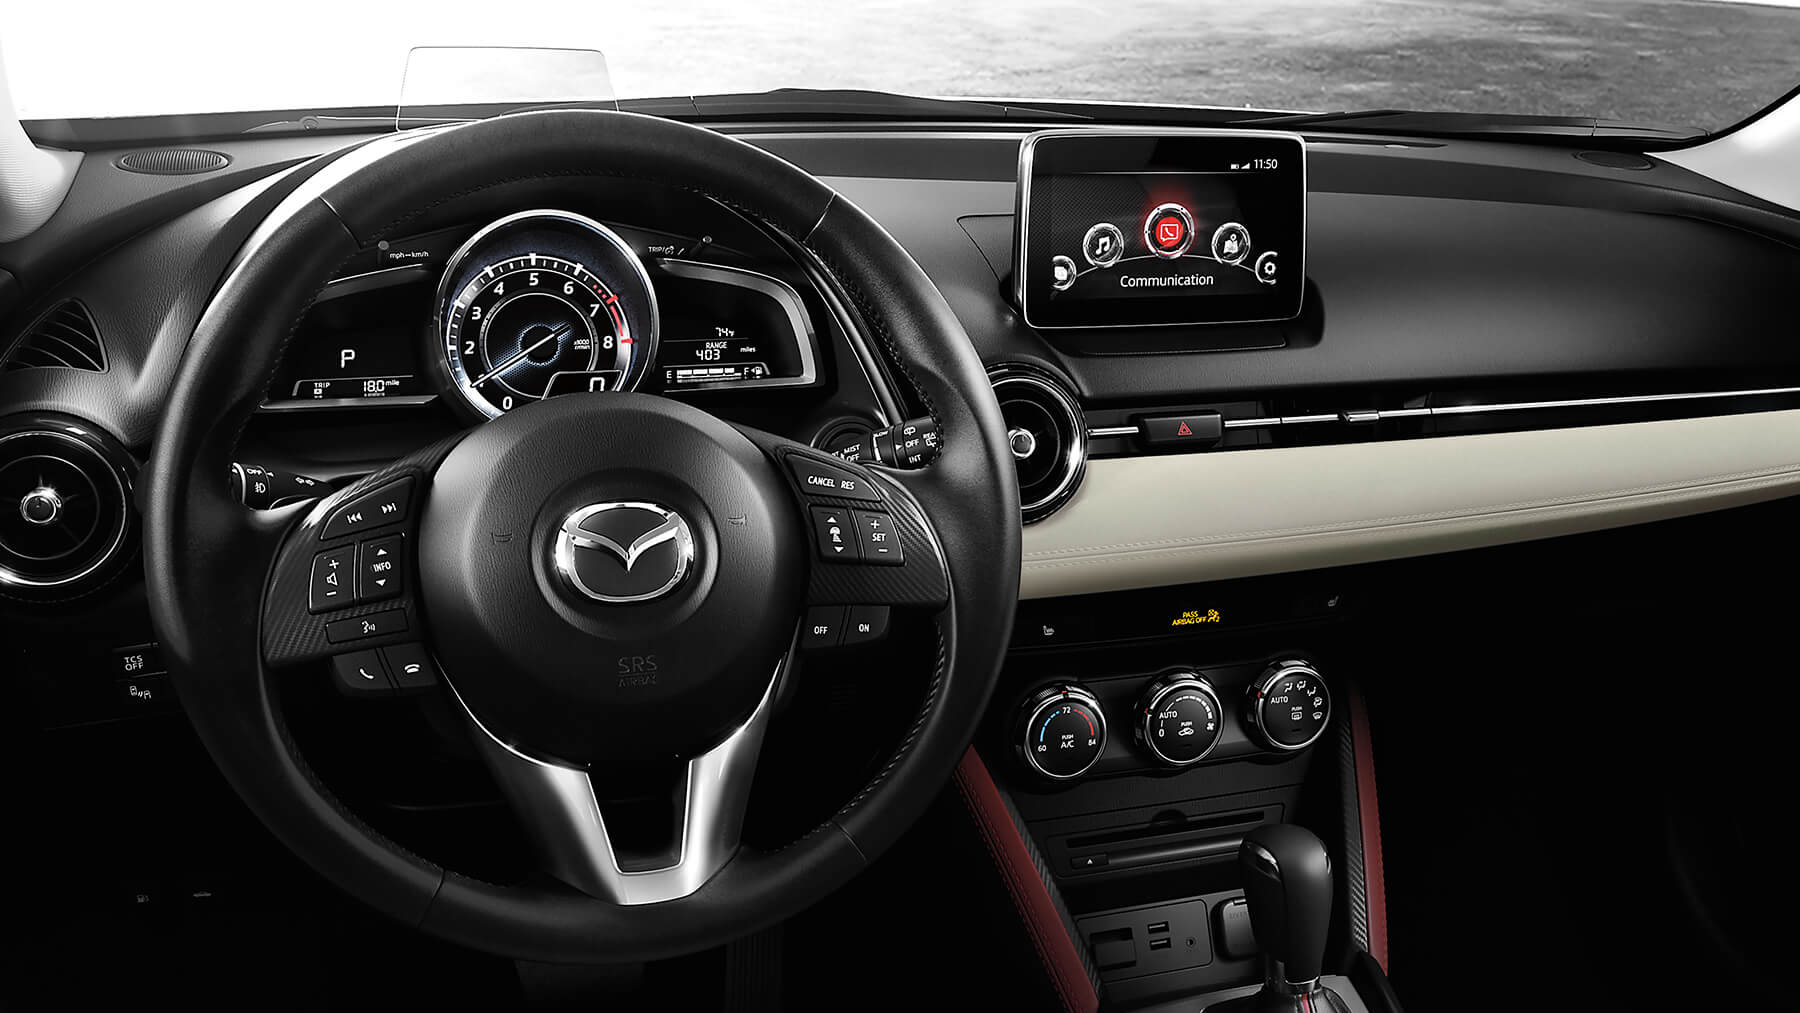 Mazda 3 Service Manual: Starter Interlock Switch Inspection Skyactiv G 2.0